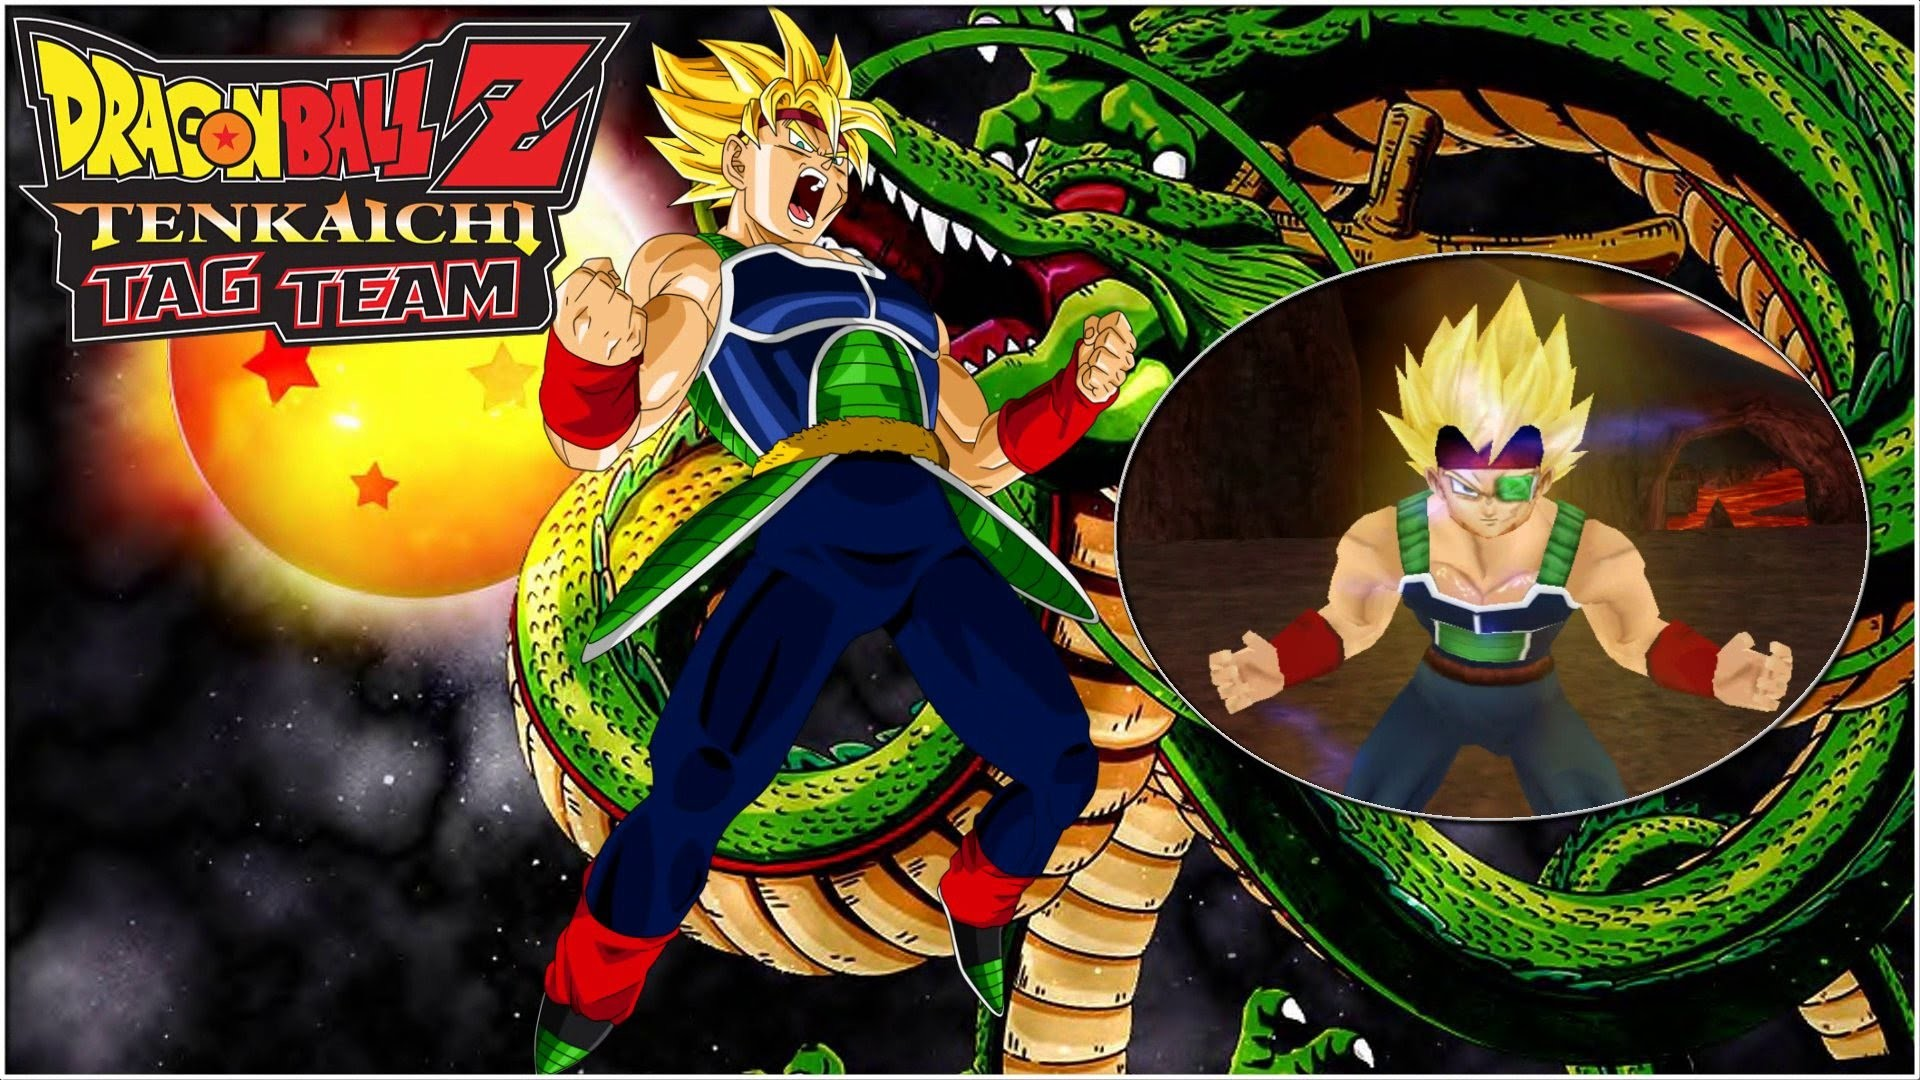 Dragon Ball Z Tenkaichi Tag Team | Bardock Super Saiyan (MOD) Gameplay –  YouTube